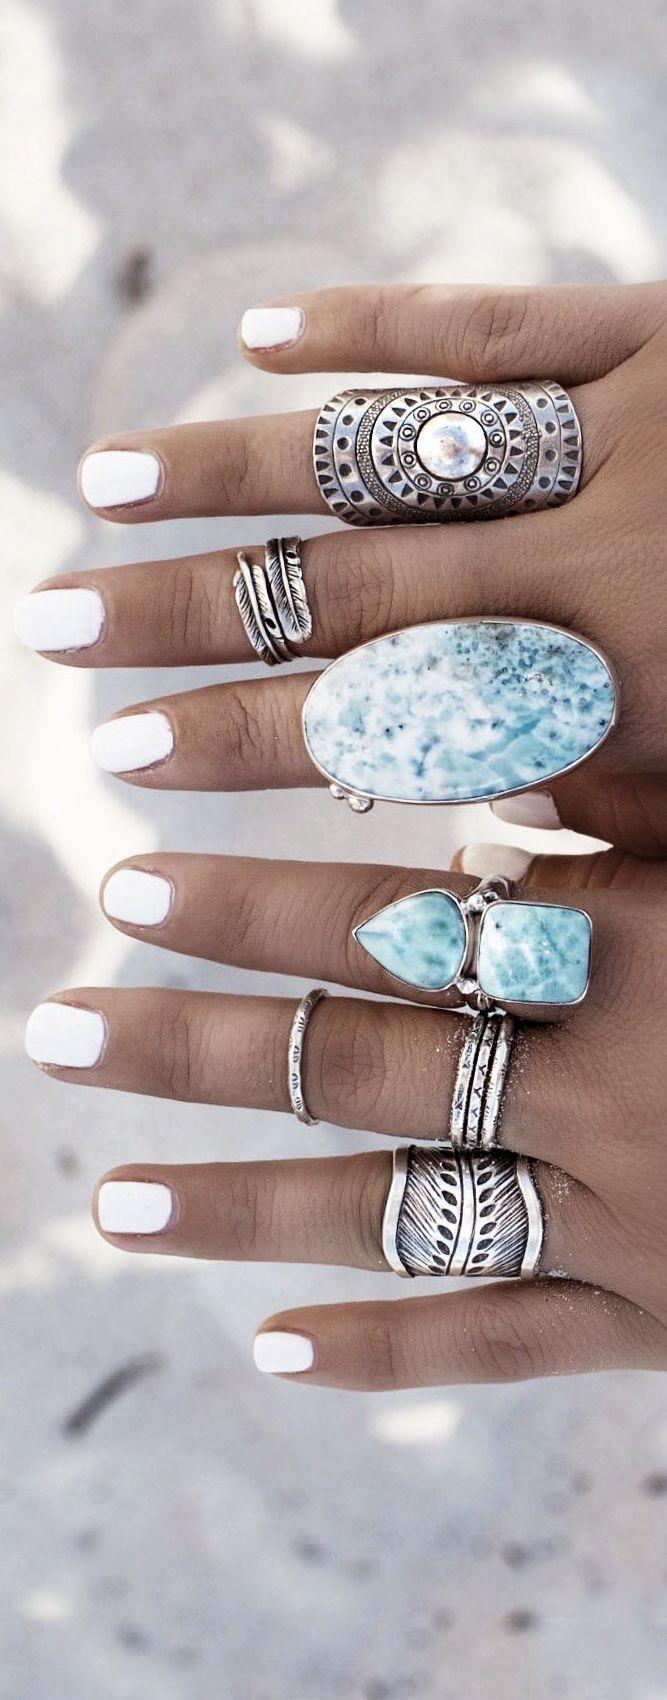 Boho rings style